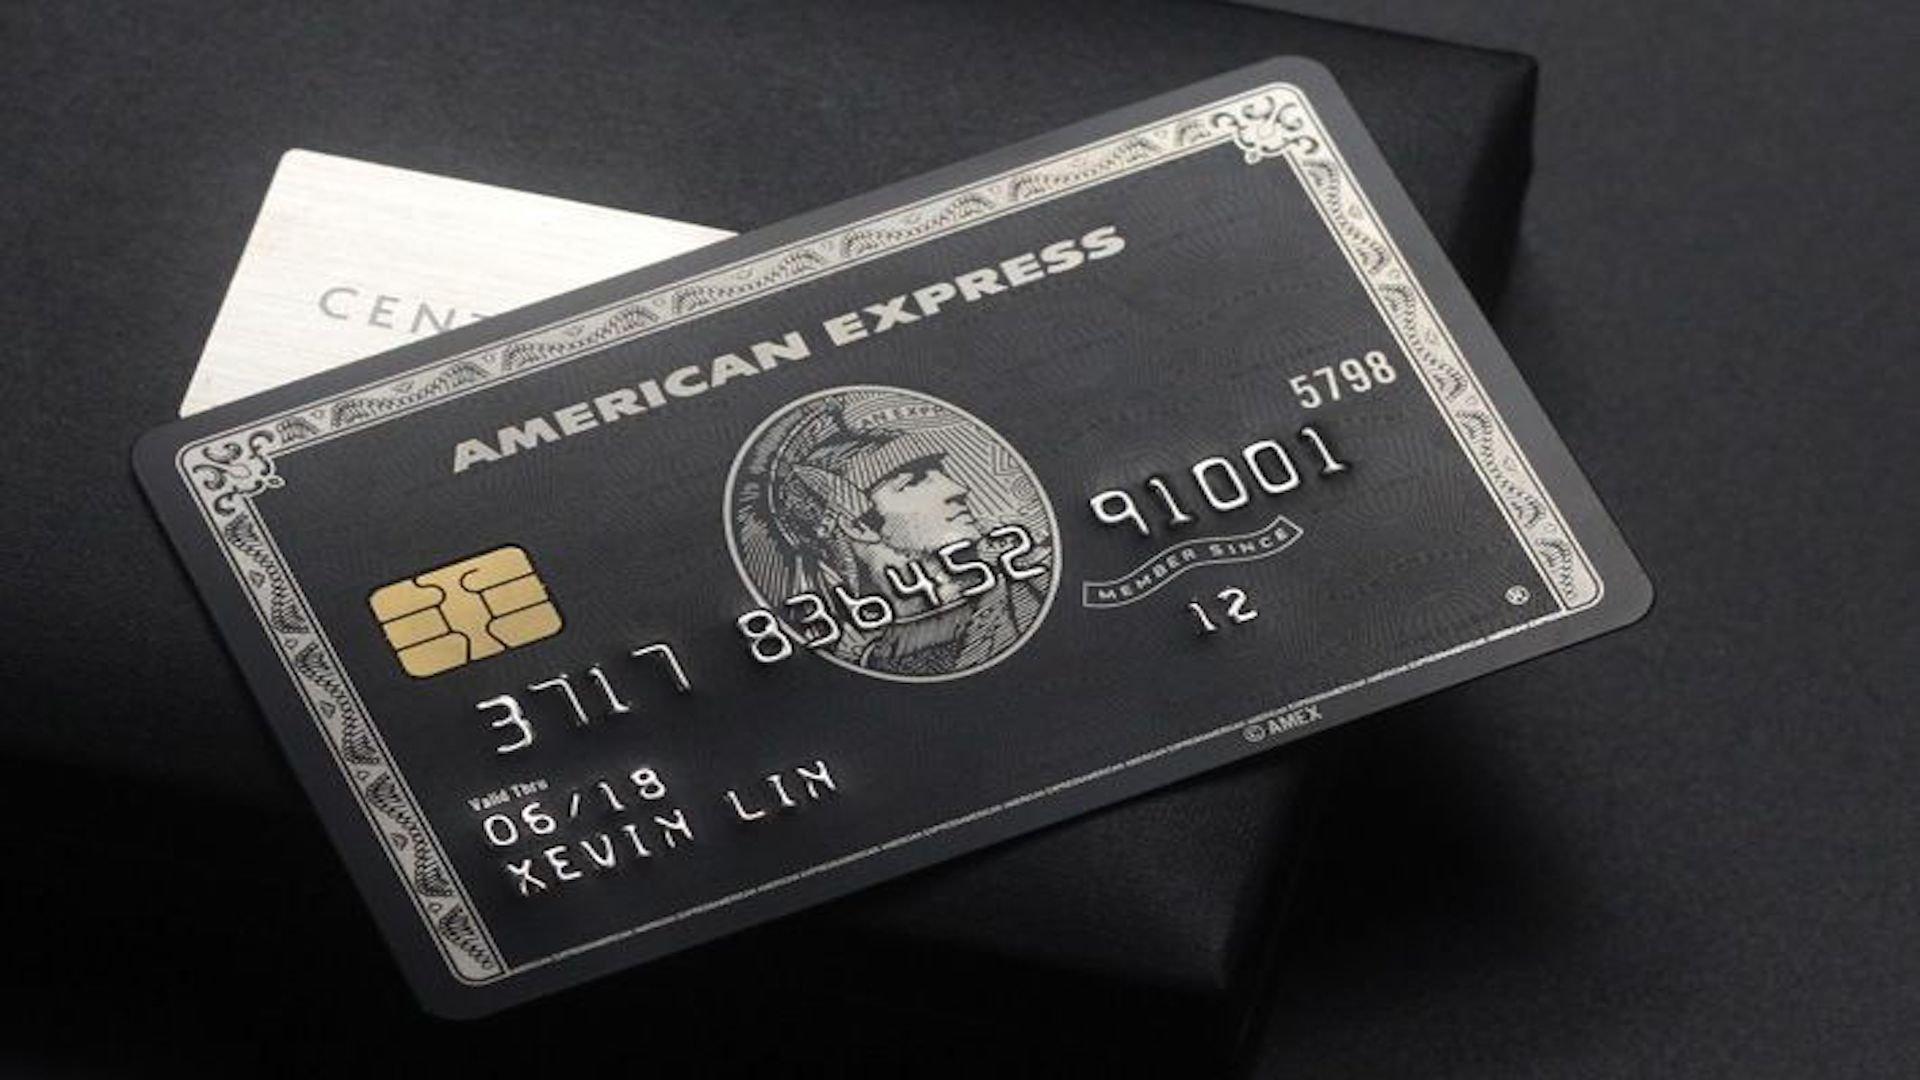 American Express (Amex) Black Card